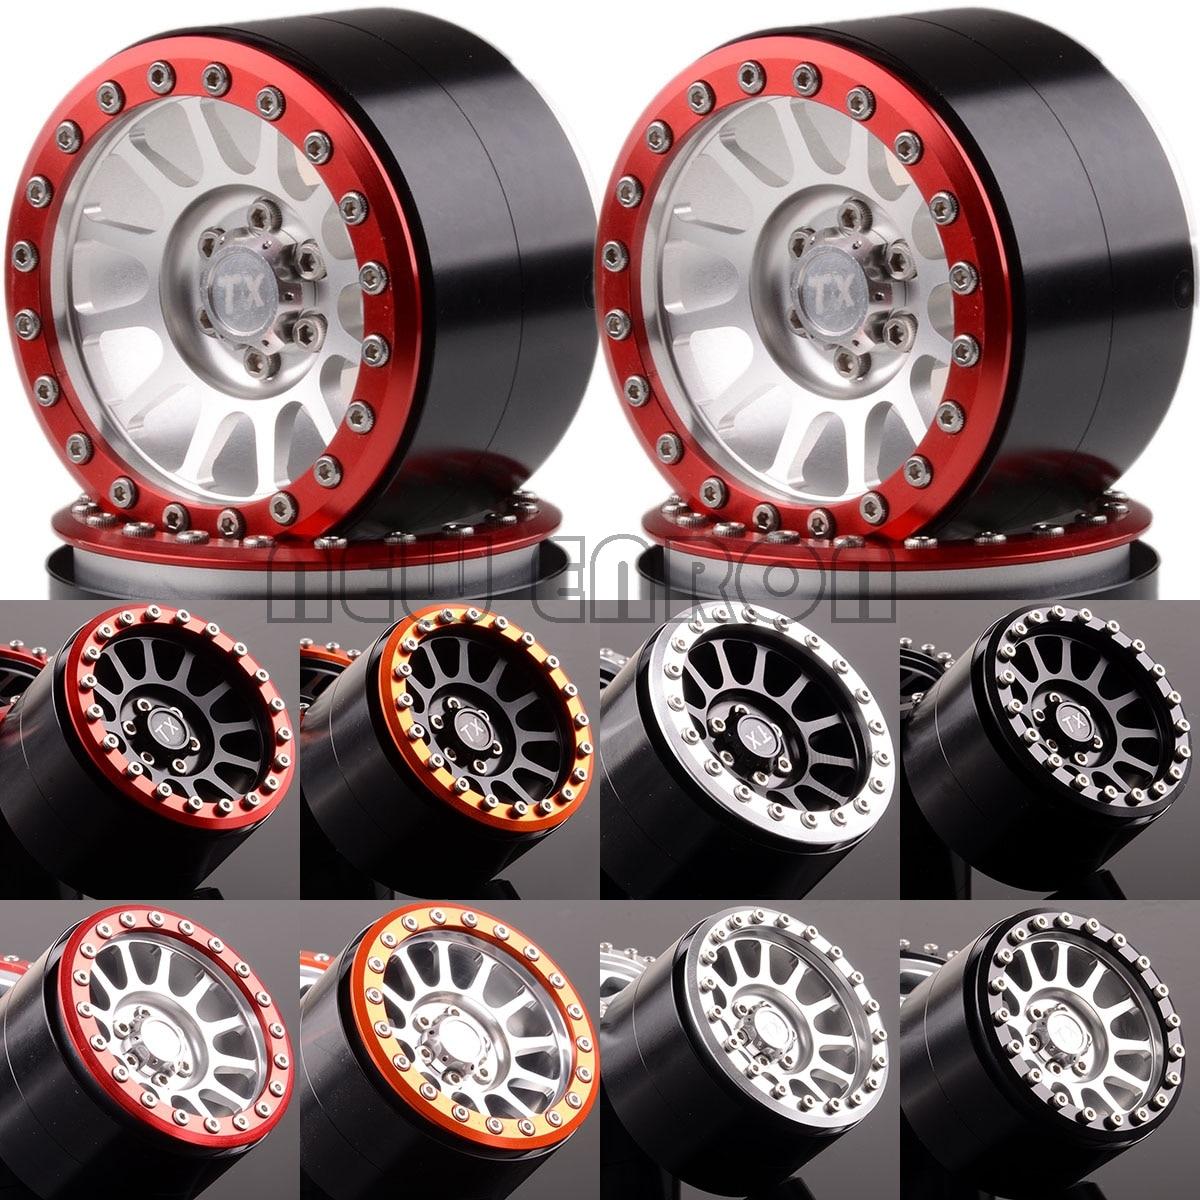 "NEW ENRON 4P 2.2"" Metal 12 Spokes Beadlock Wheels Rims hub For Axial SCX10 SCX10 II 90046 90047 RR10 Wraith YETI 90056 90053(China)"